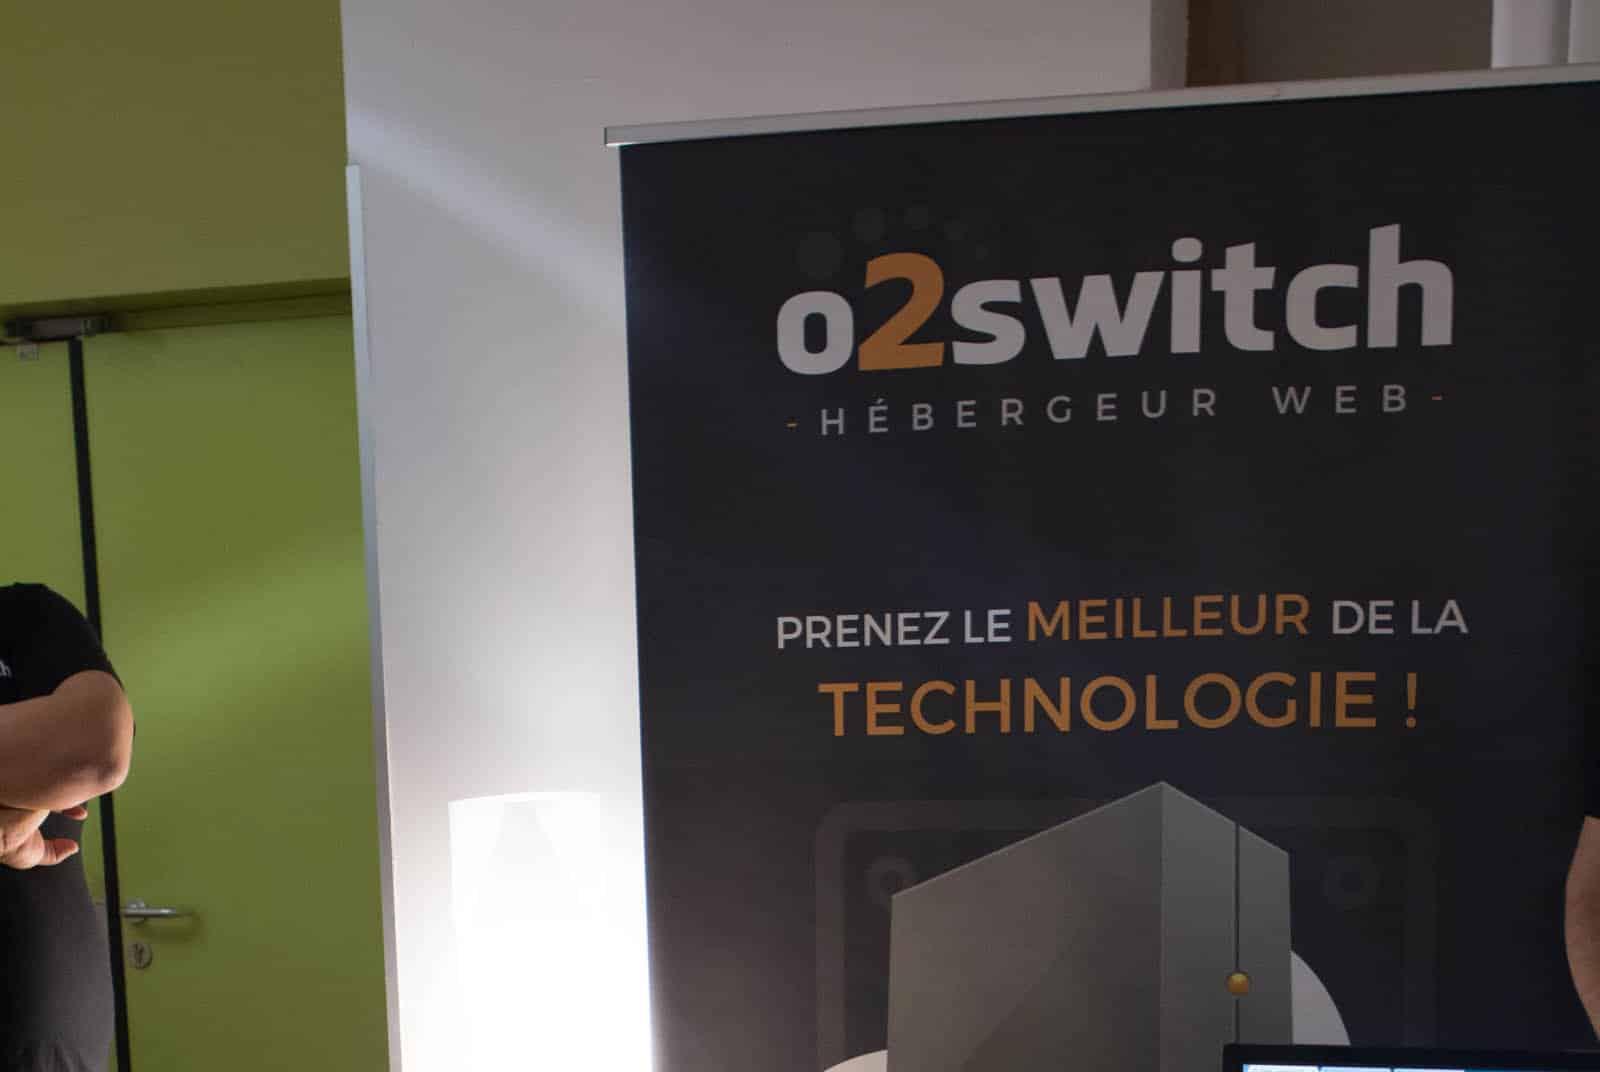 O2swicth